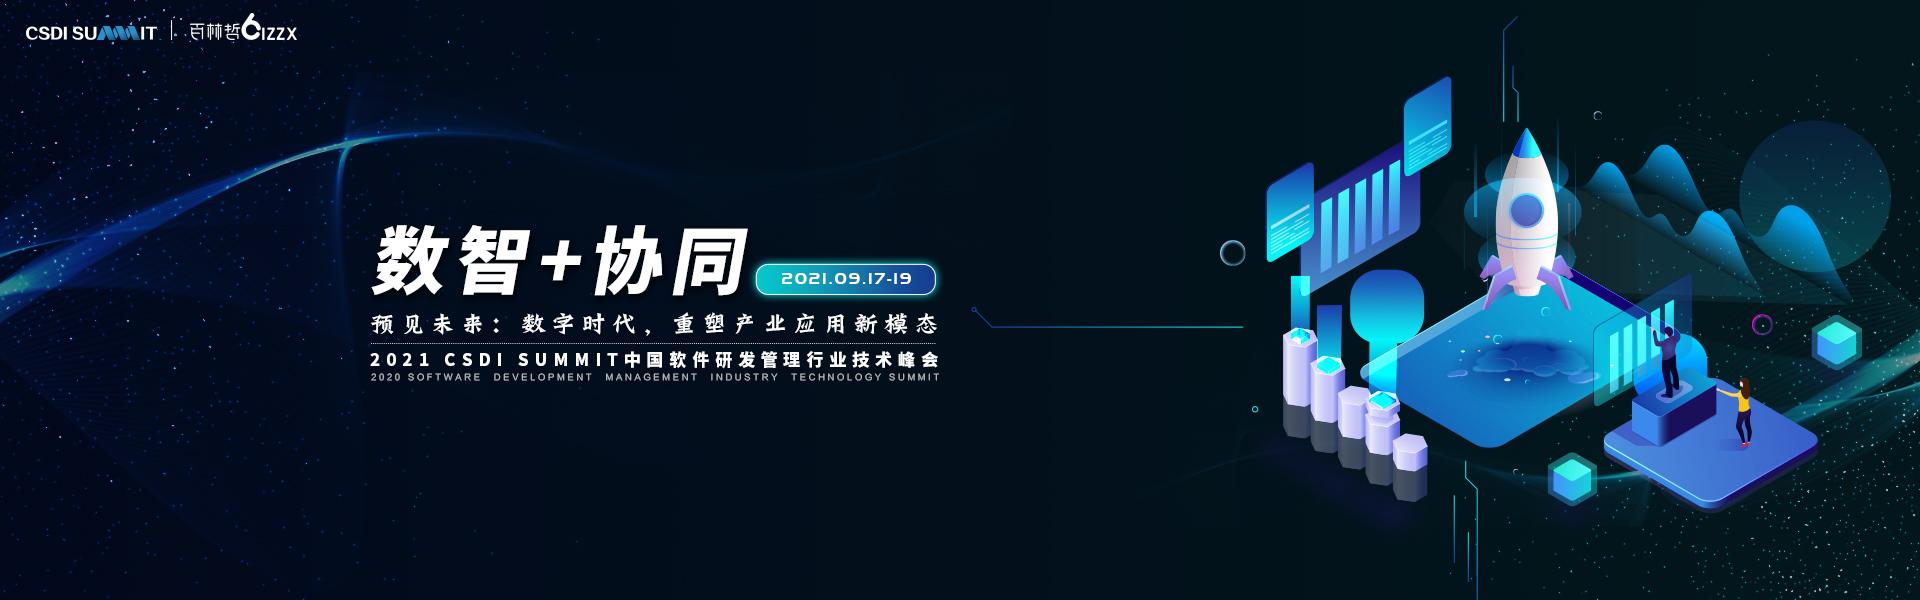 主视觉banner-022.jpg